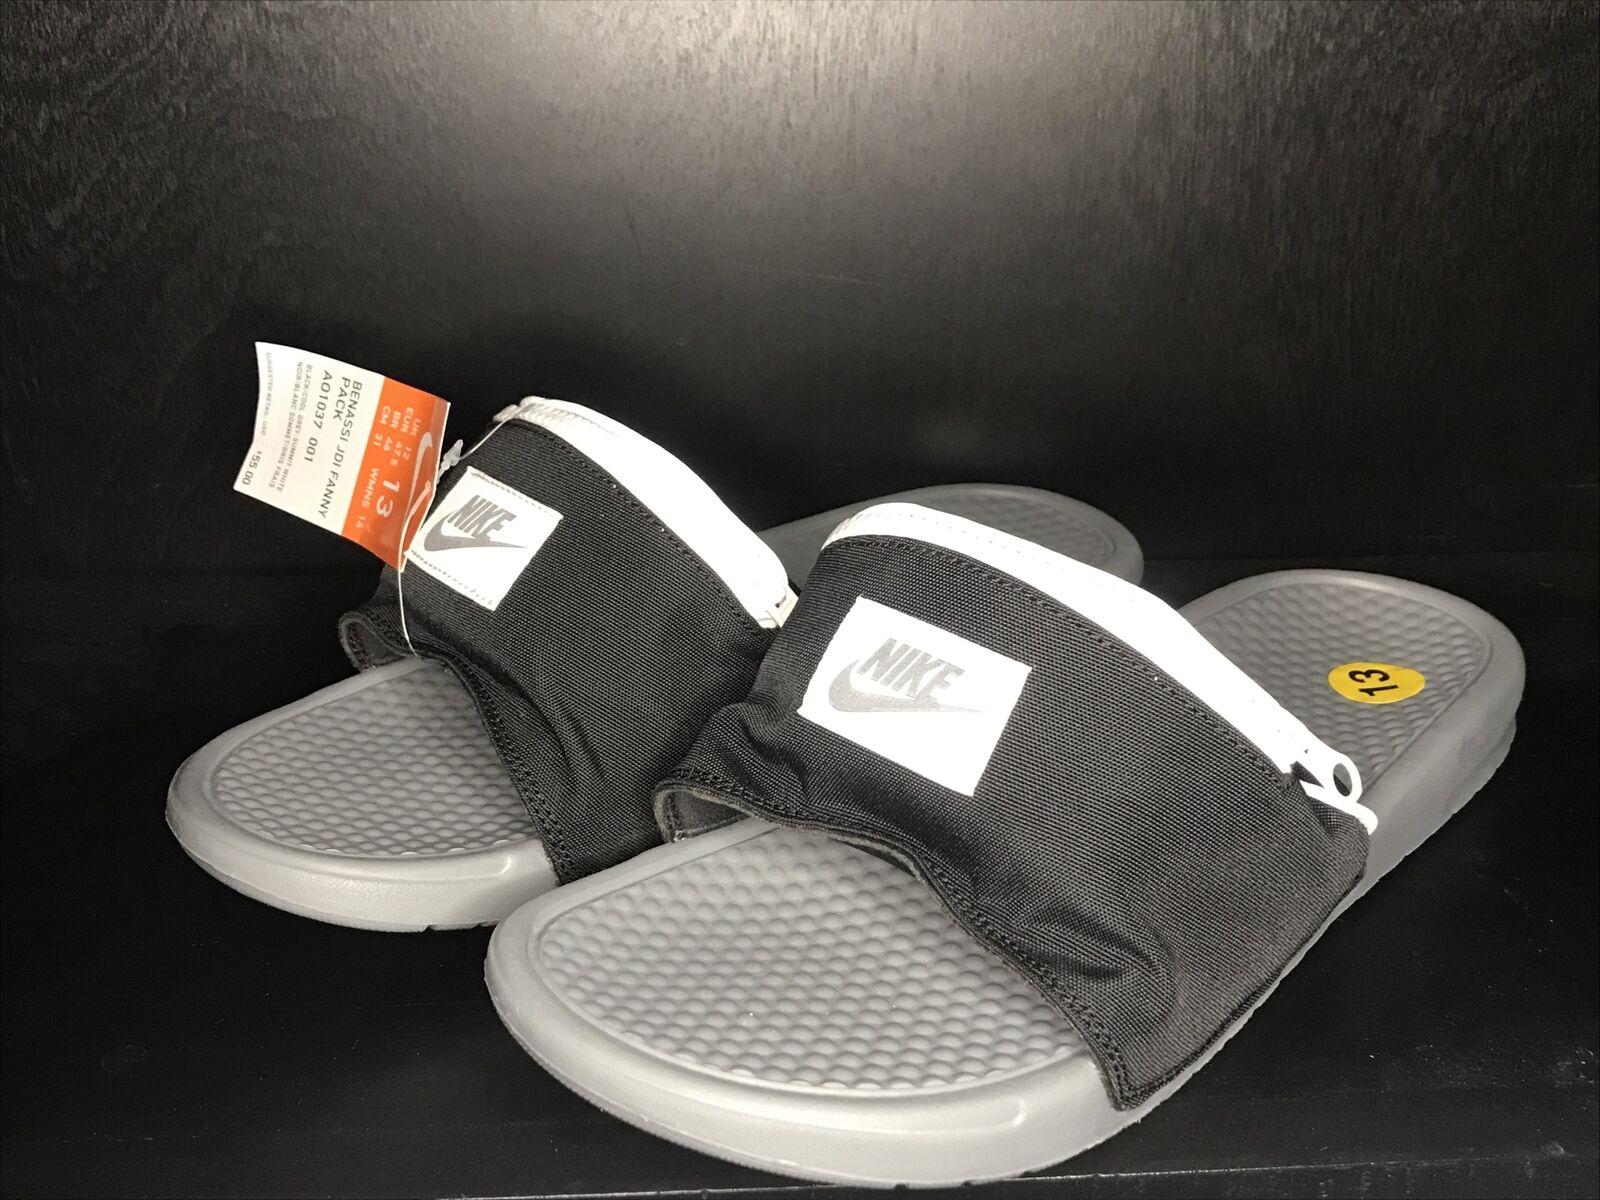 enlace fondo Vandalir  NEW Nike Men's Benassi JDI Fanny Pack Slides Black Grey AO1037-001 Size 13  for sale online